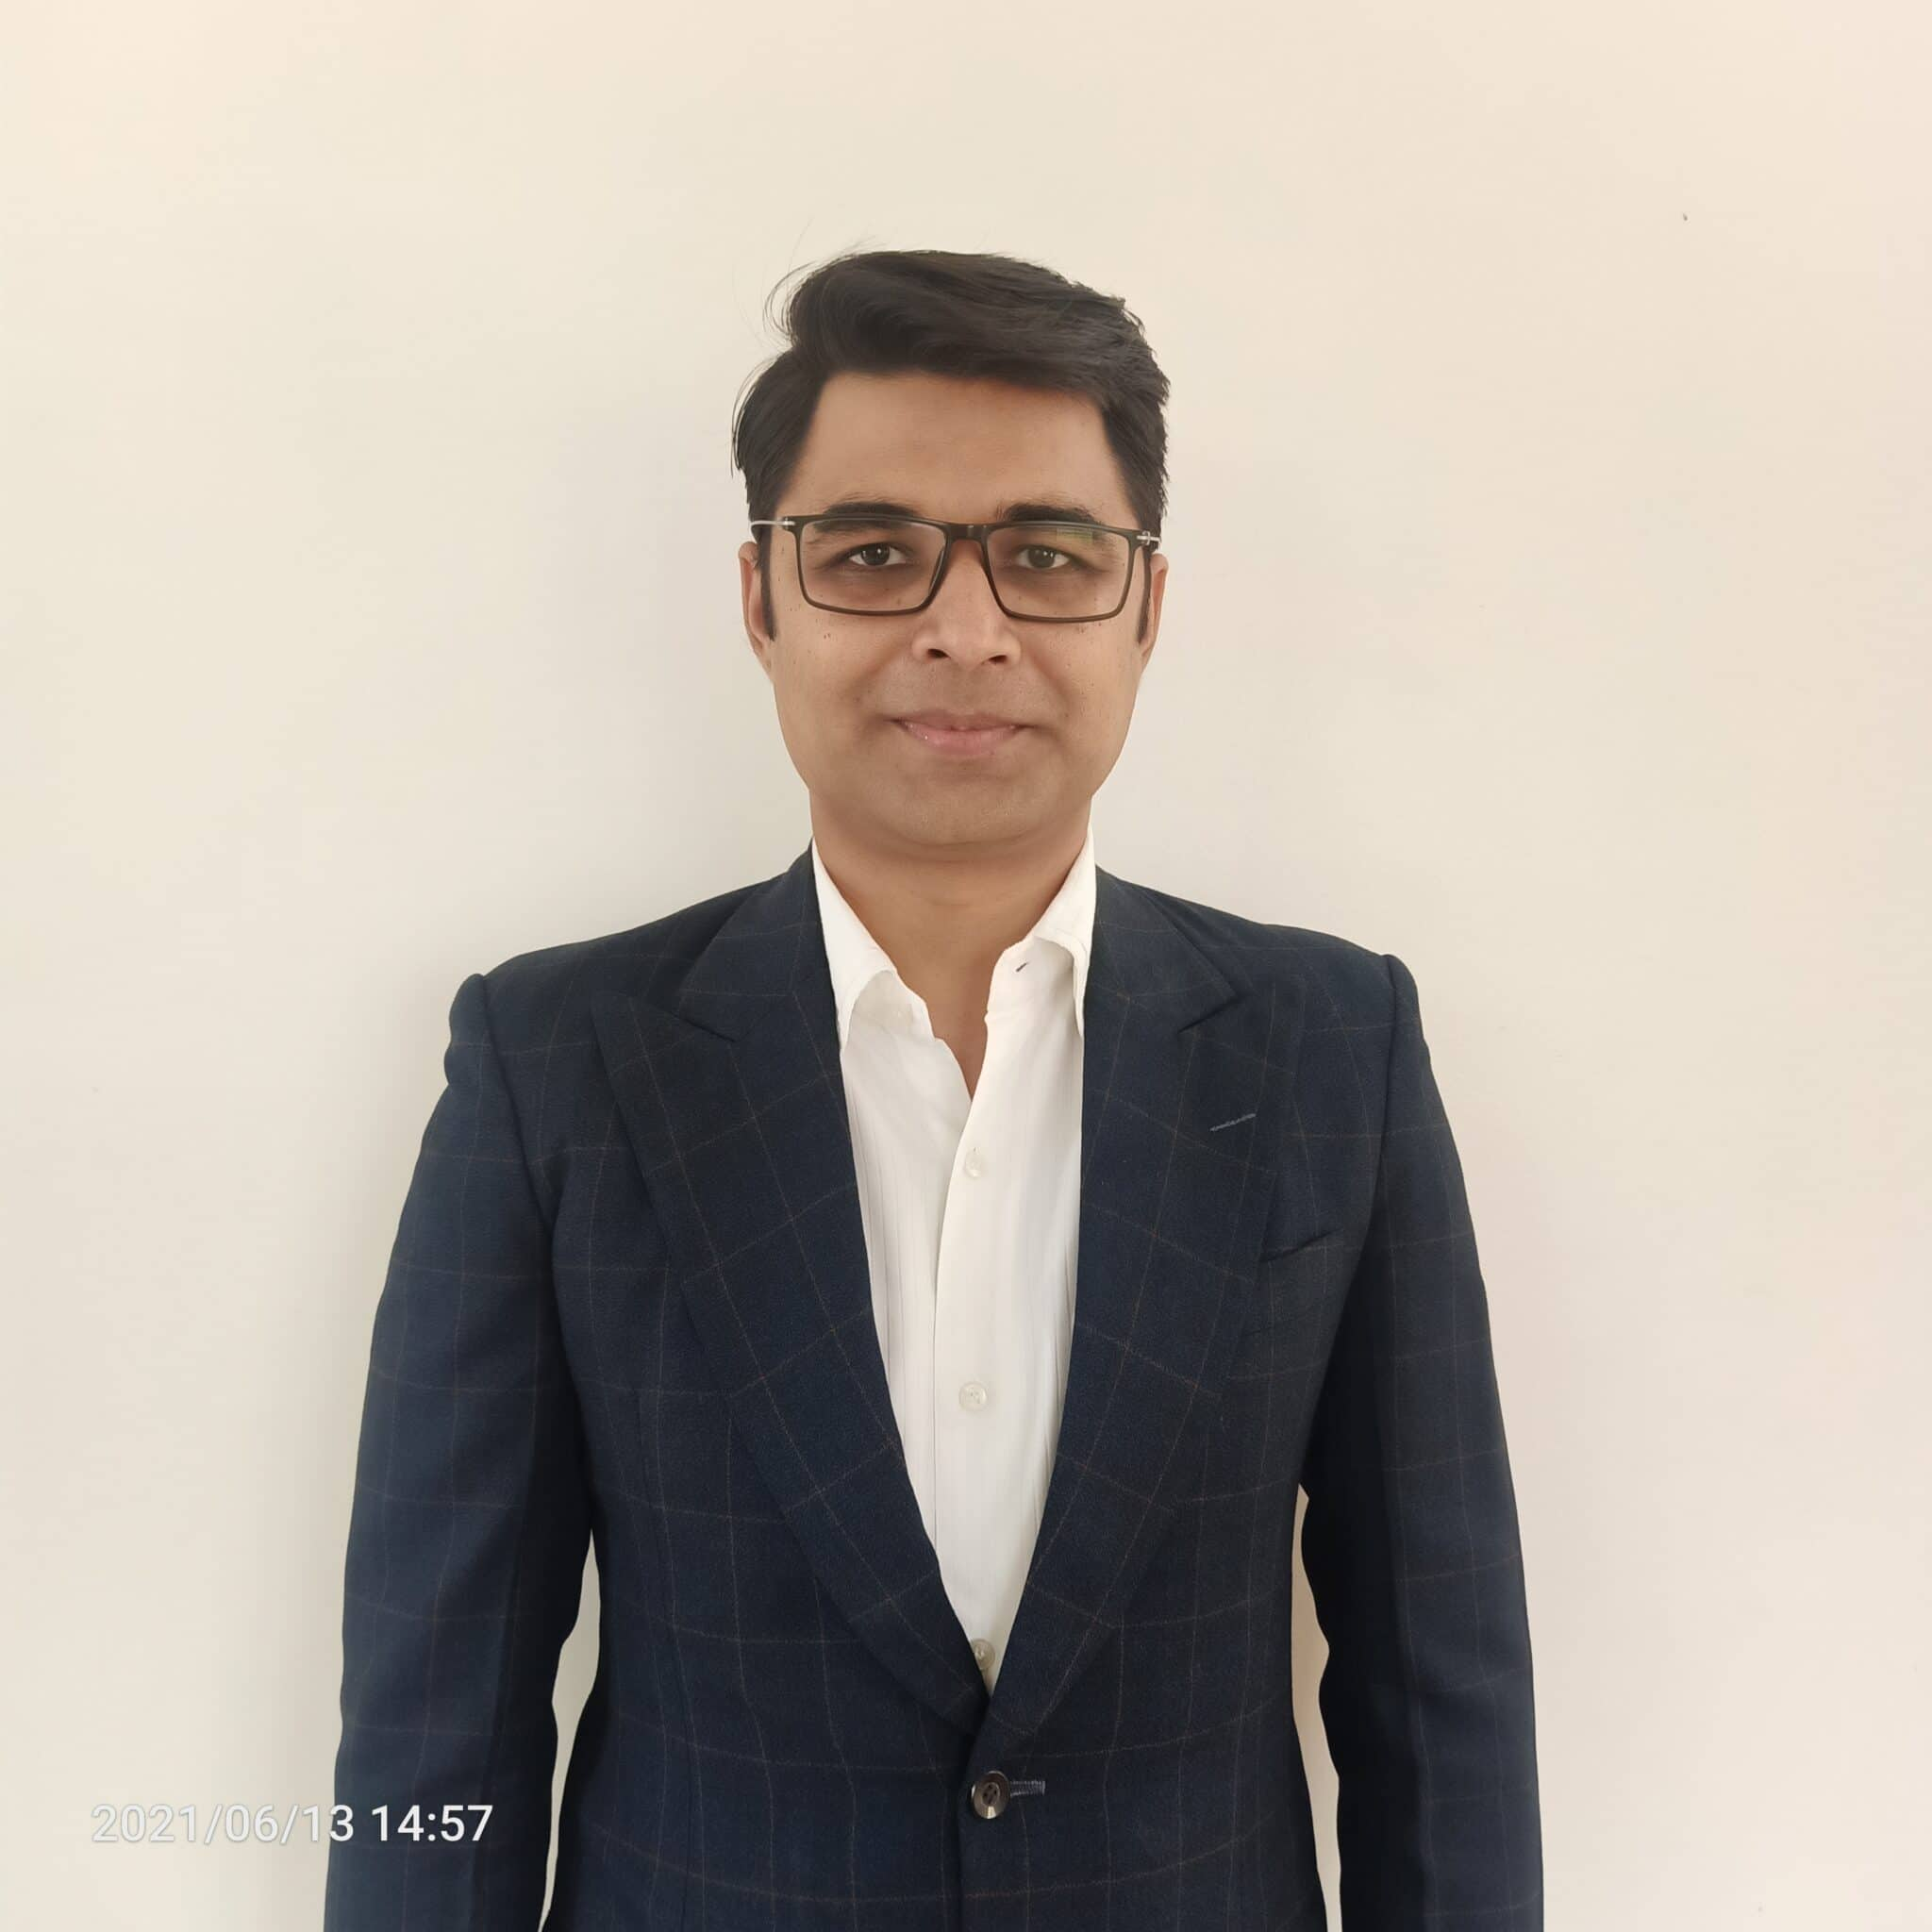 Sameer Lodha Techspian